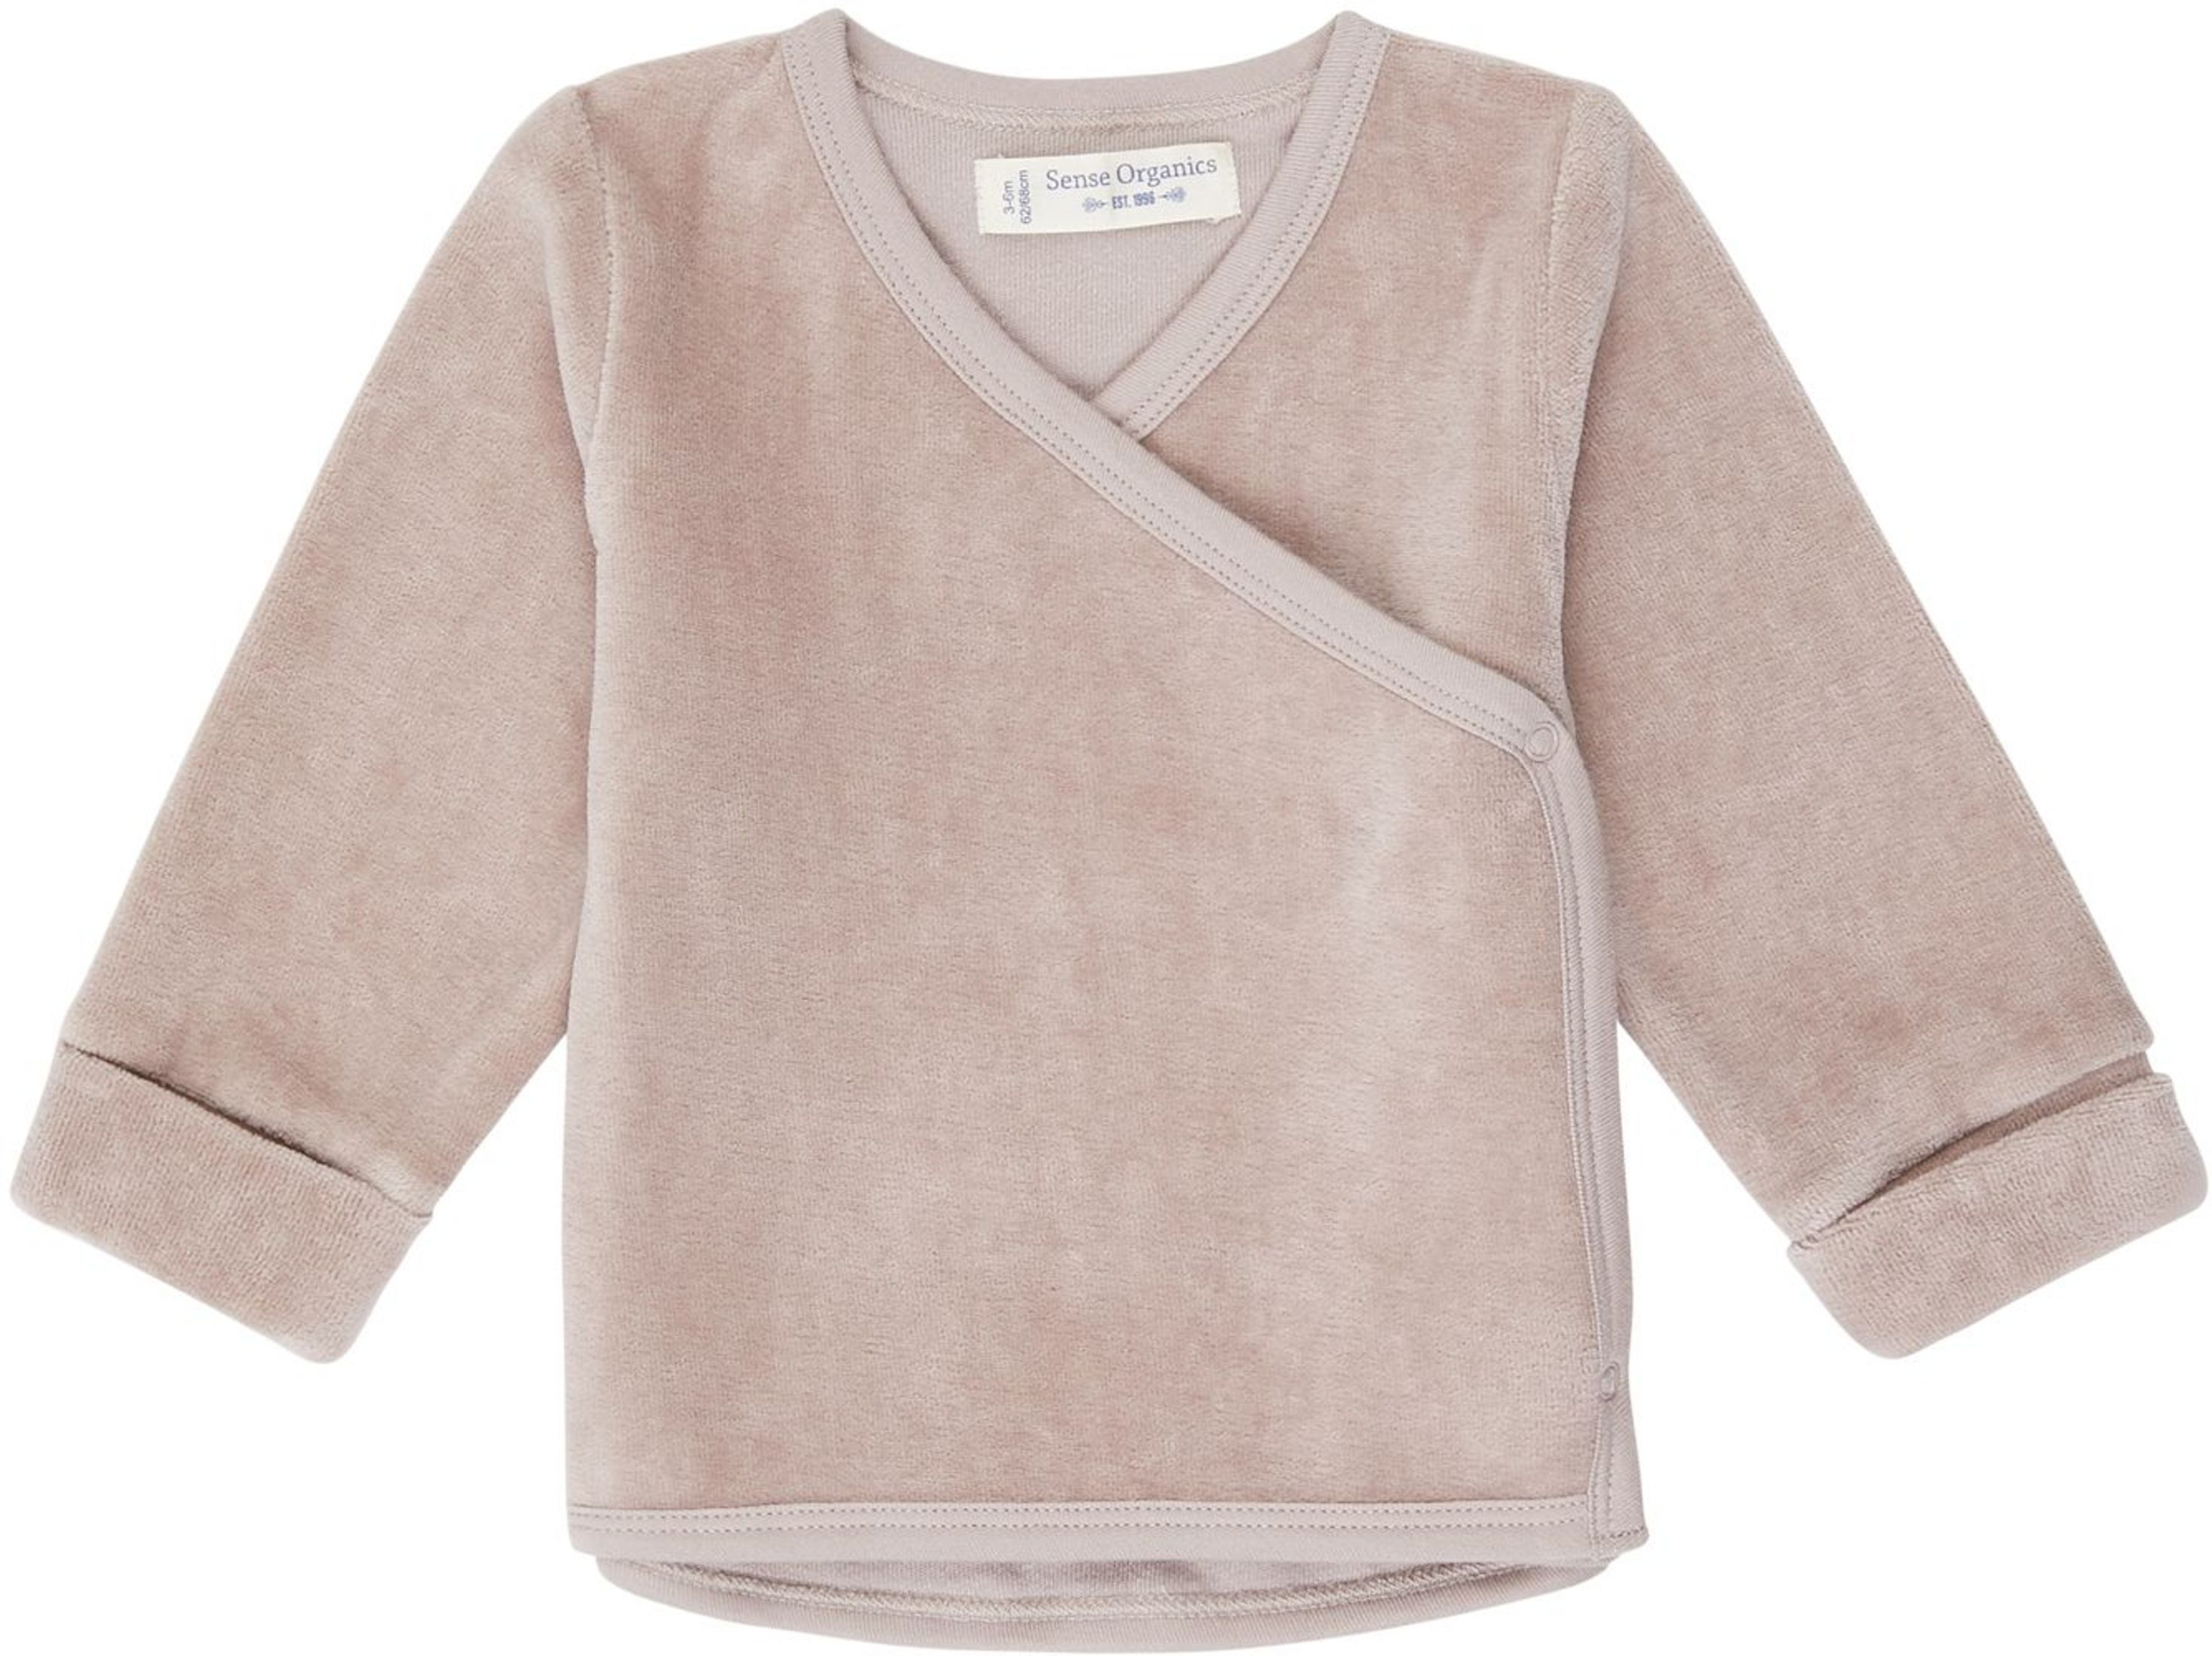 Sense Organic WANDA Baby Velour Wrap Jacket taupe